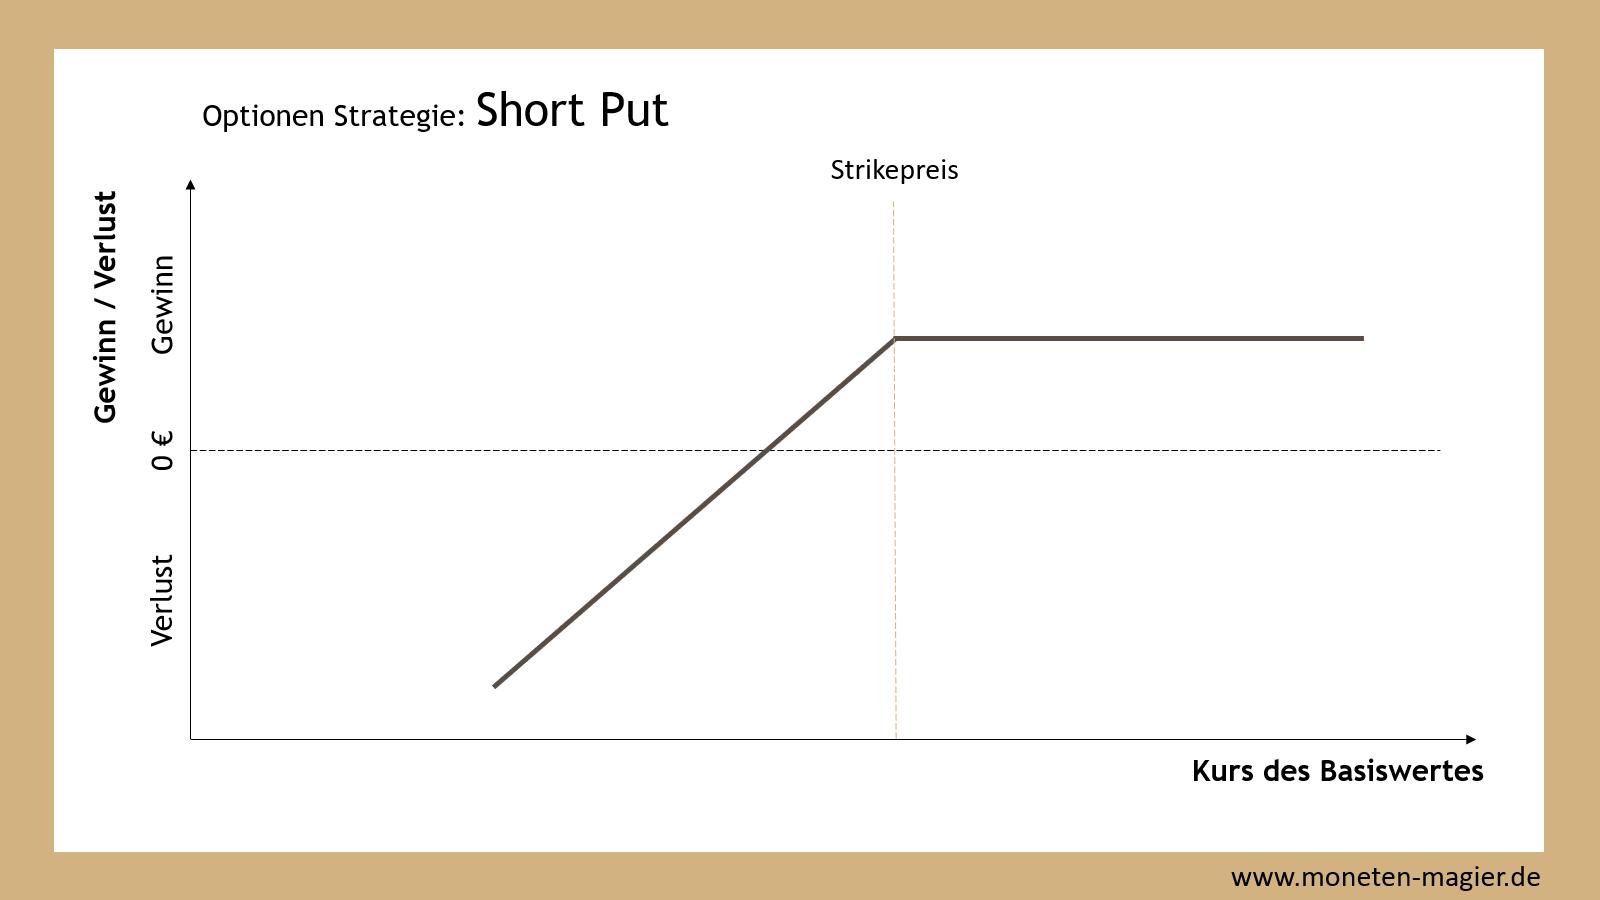 optionen verkaufen moneten magier short put